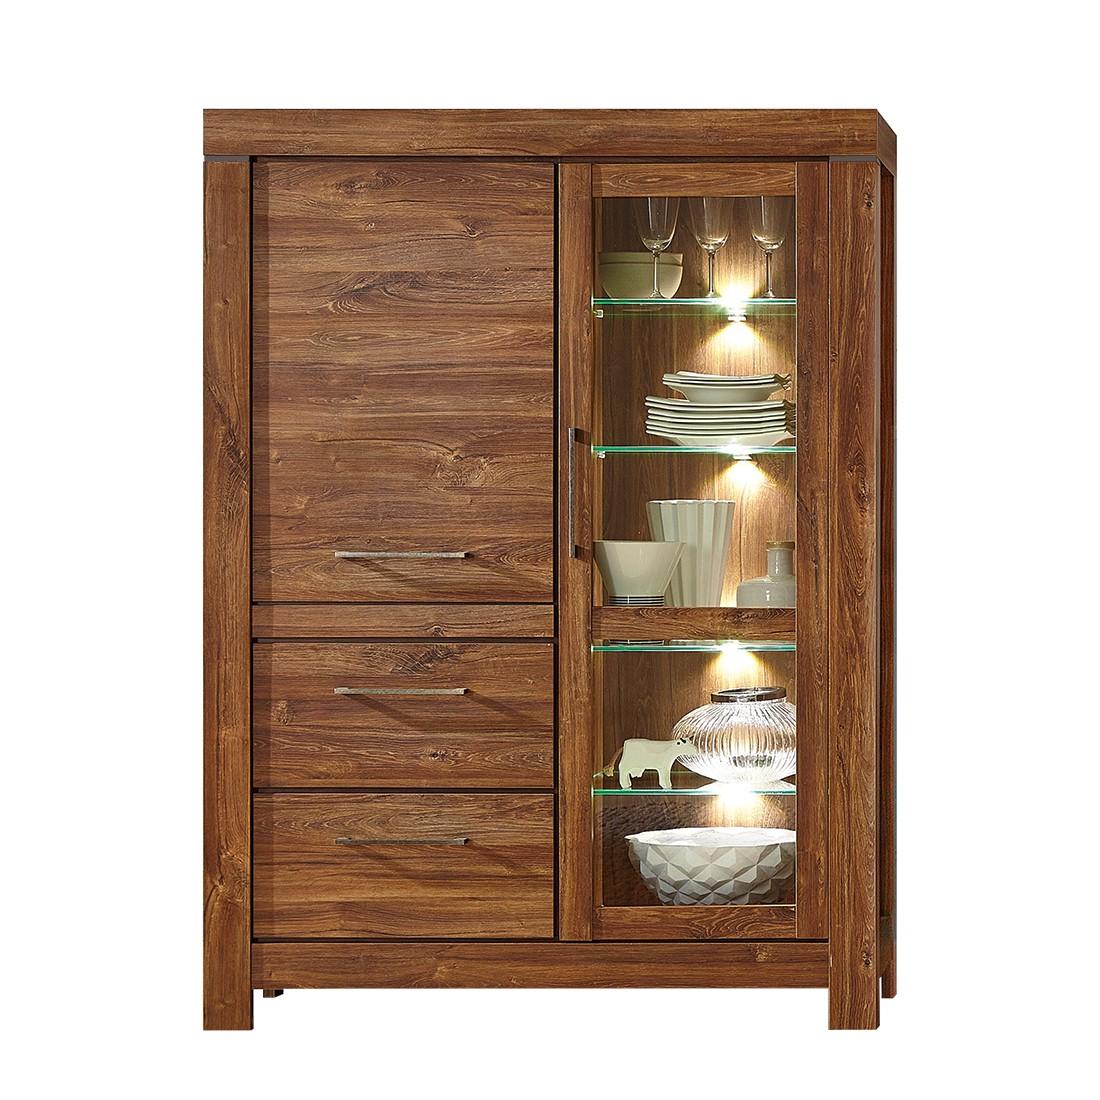 EEK A+, Armoire vitrine Blairmore (éclairage fourni) I - Imitation acacia, loftscape